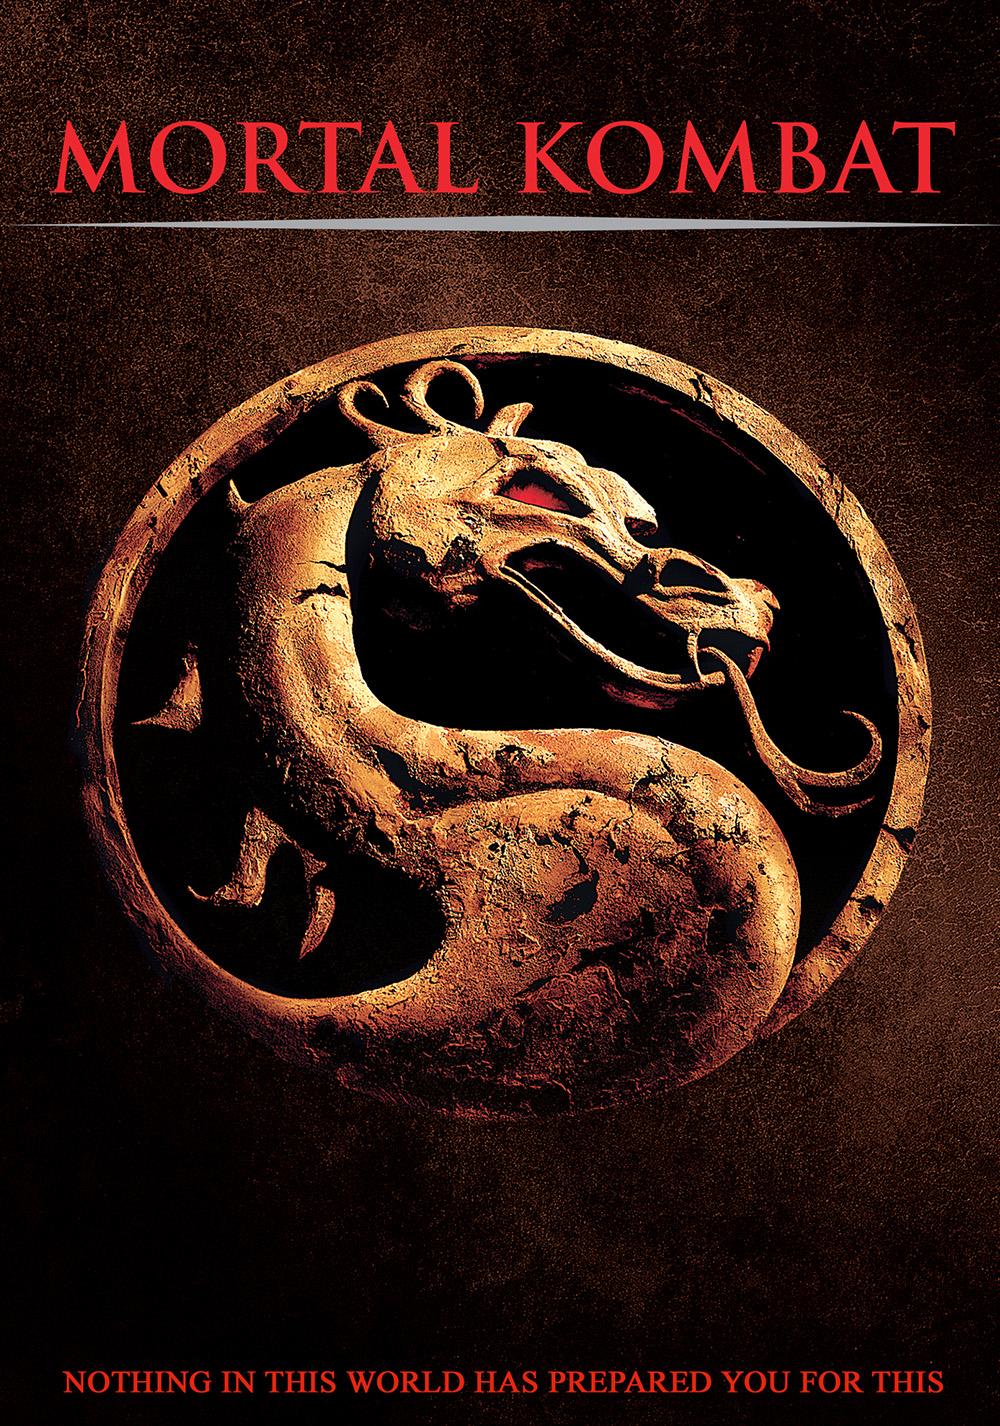 Mortal Kombat   Movie fanart   fanart.tv - photo#29